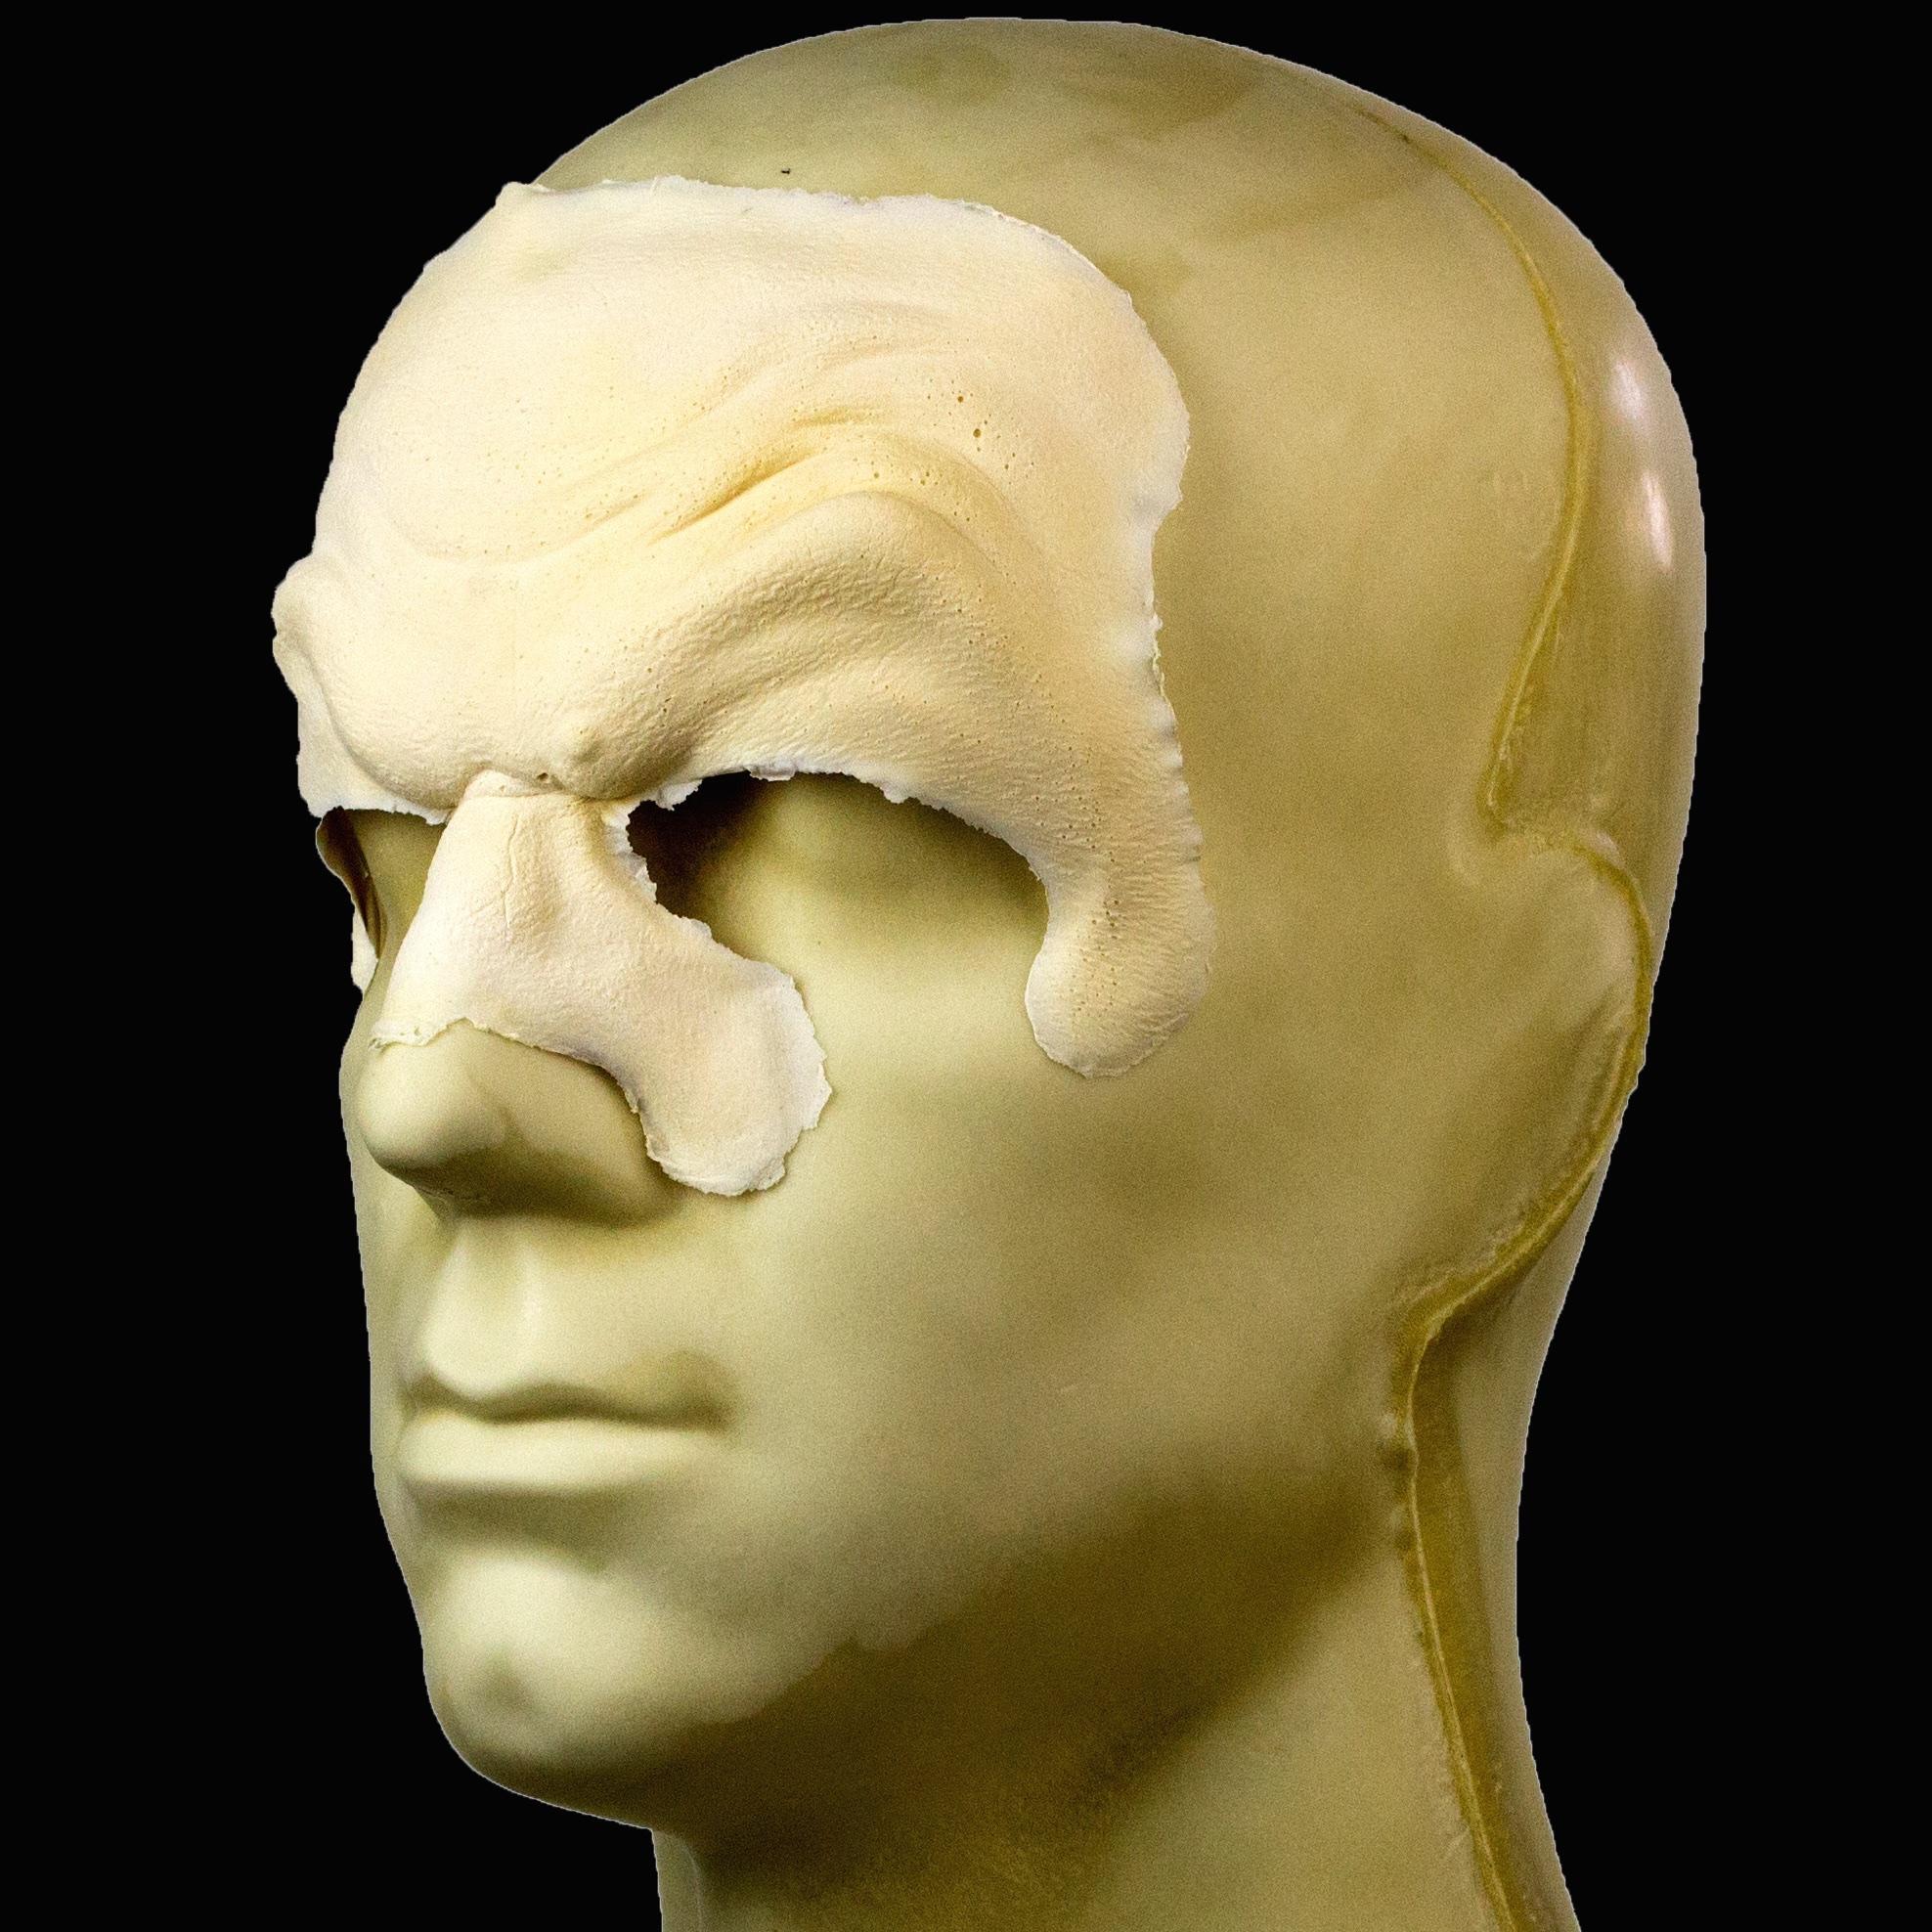 Rubber Wear- Evil Forehead